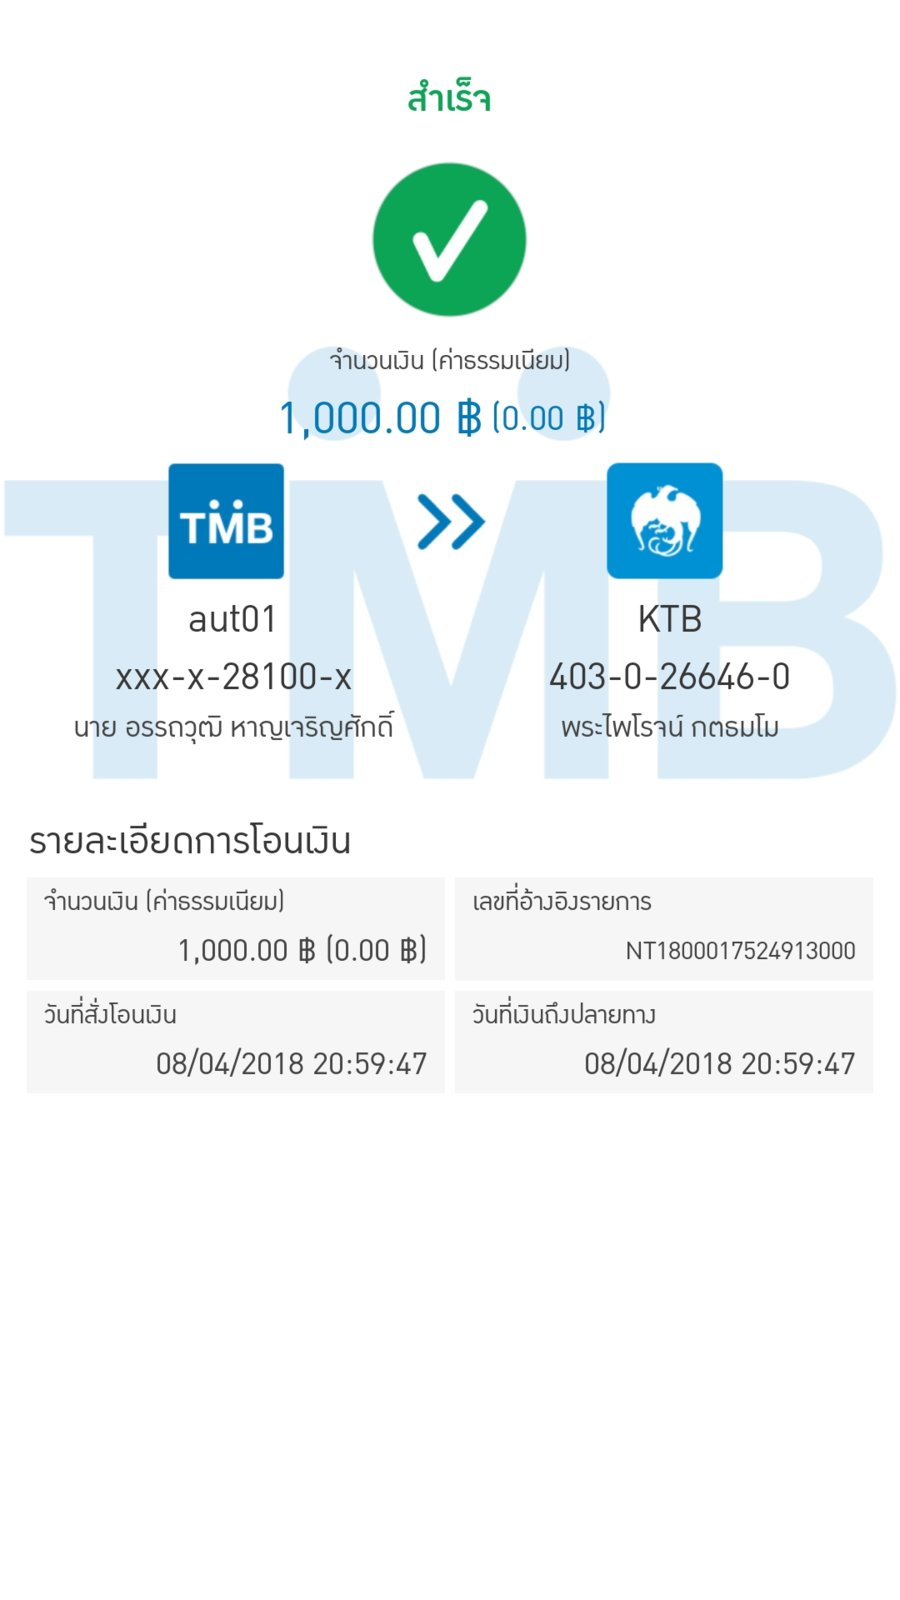 Transfer-08-4-2018 08:59:50.jpg